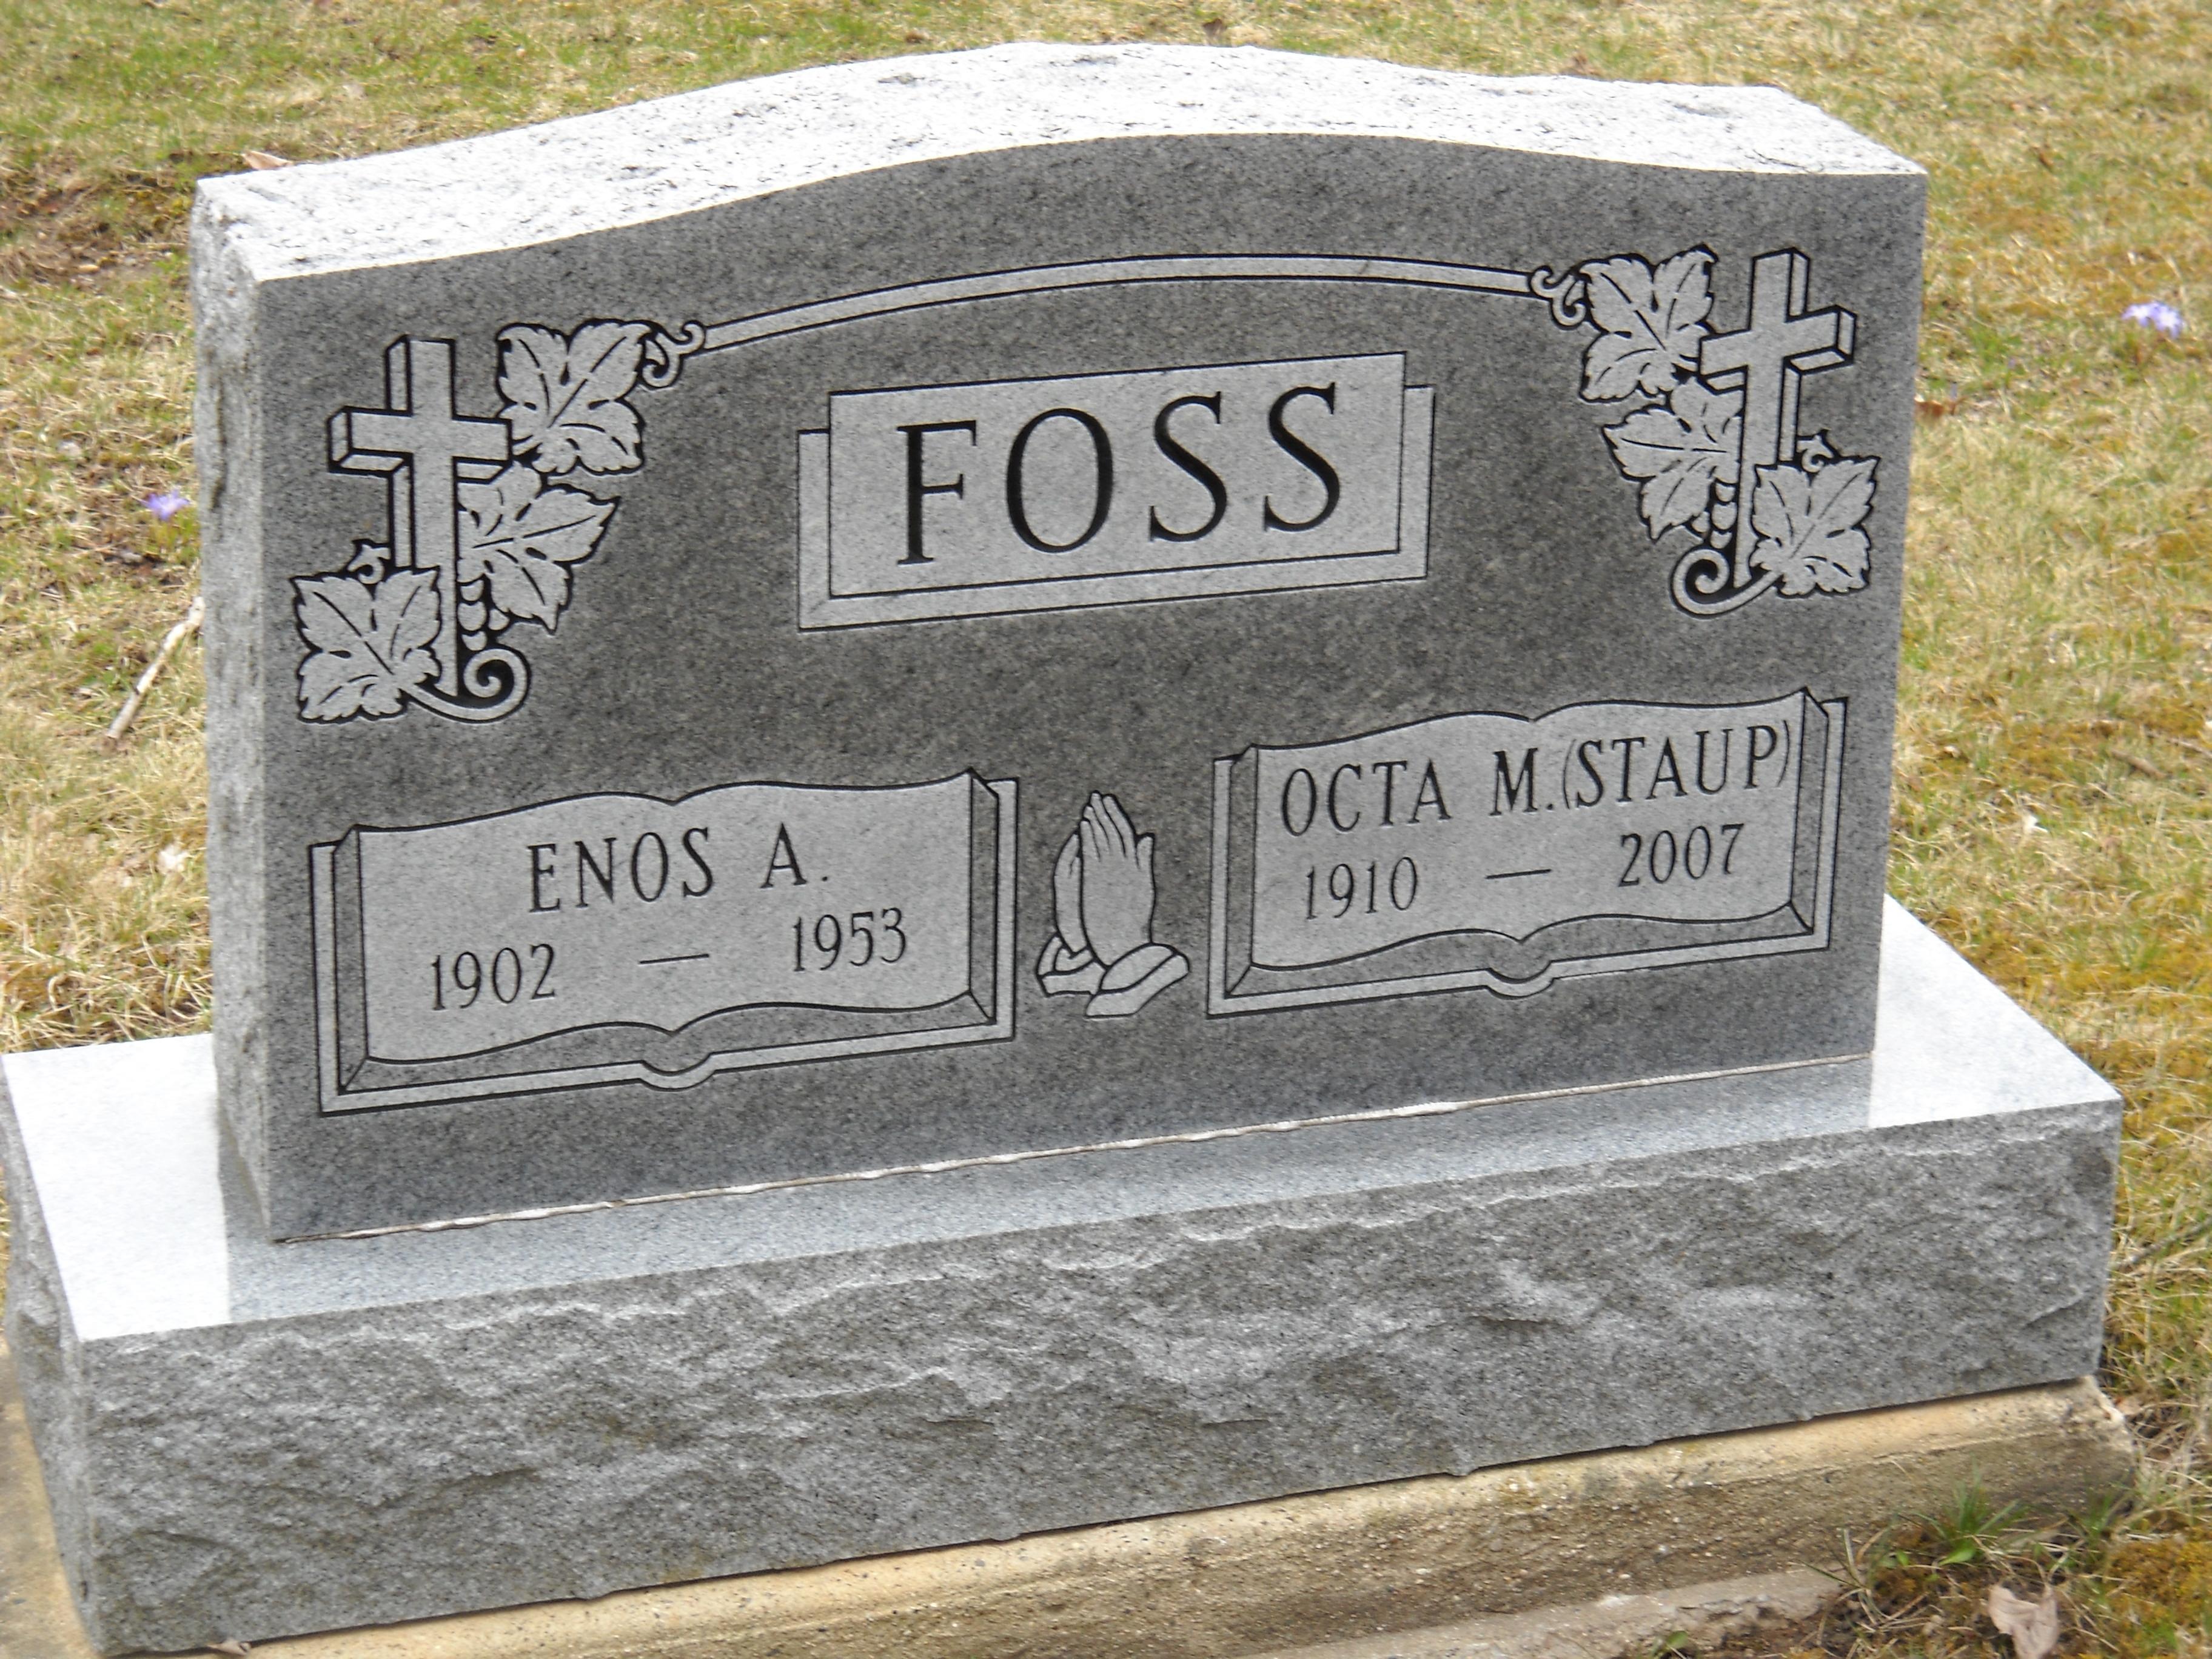 Enos Aldrich Foss